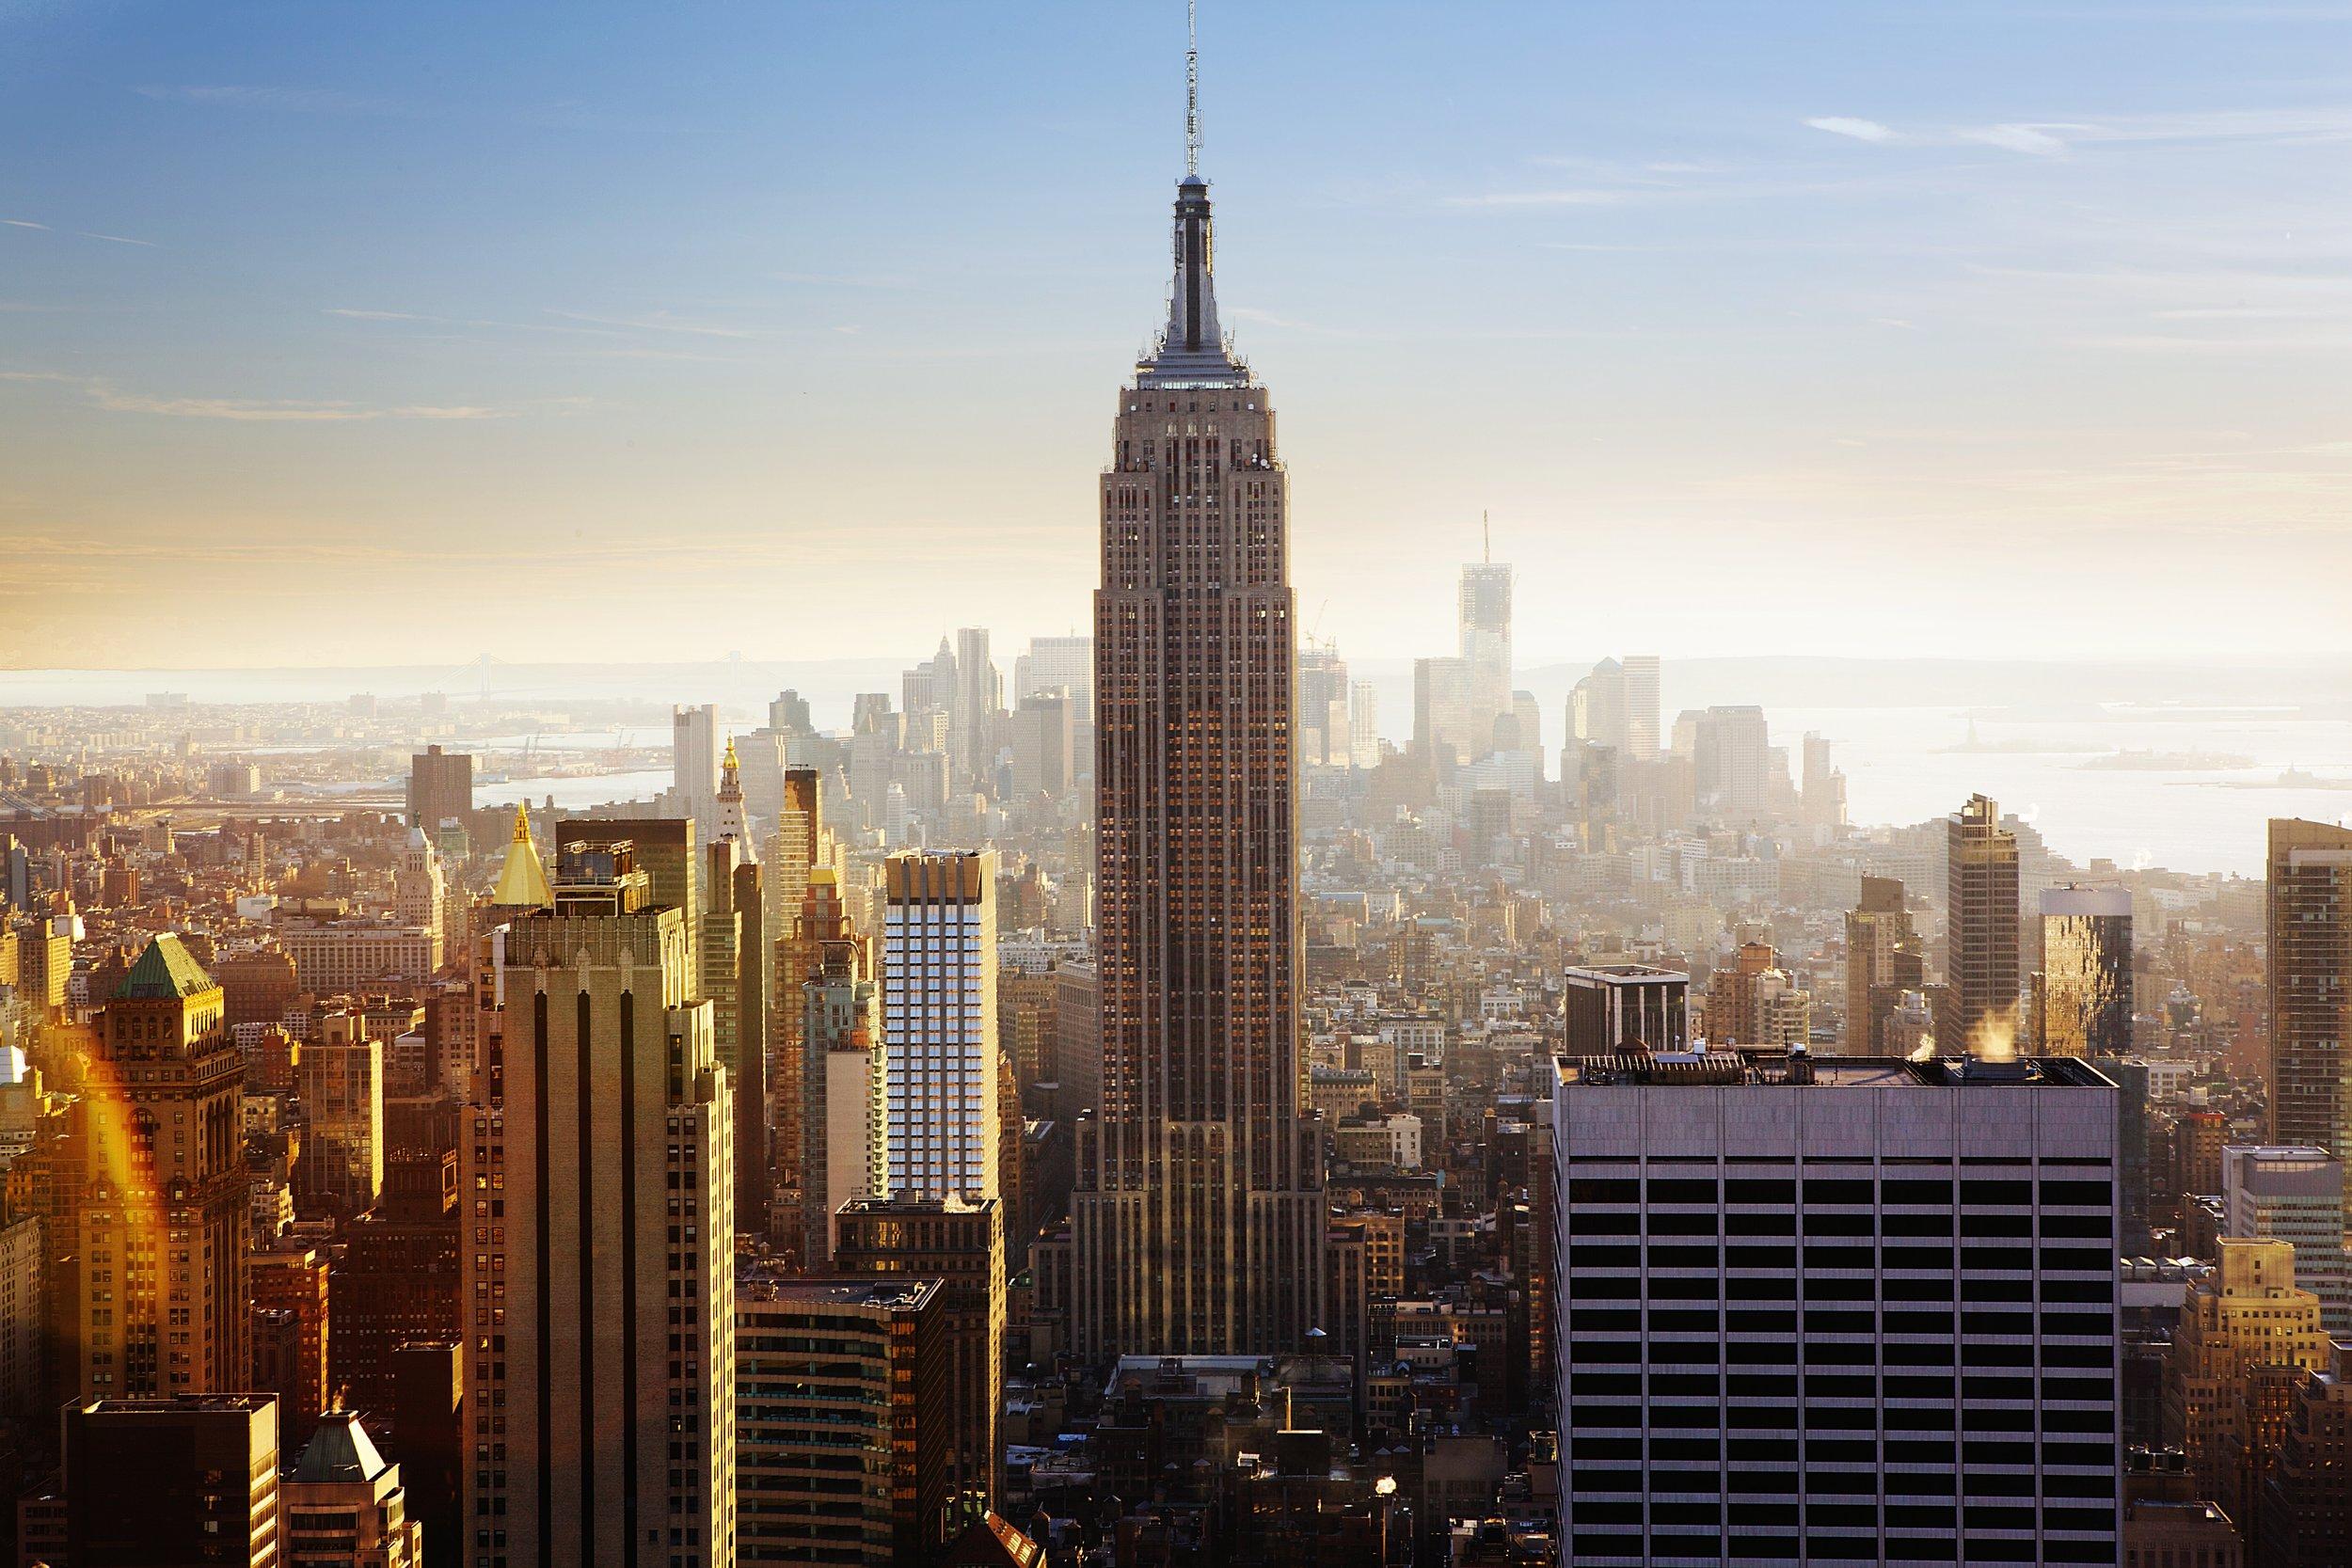 NEW YORK - SUMMER 2019